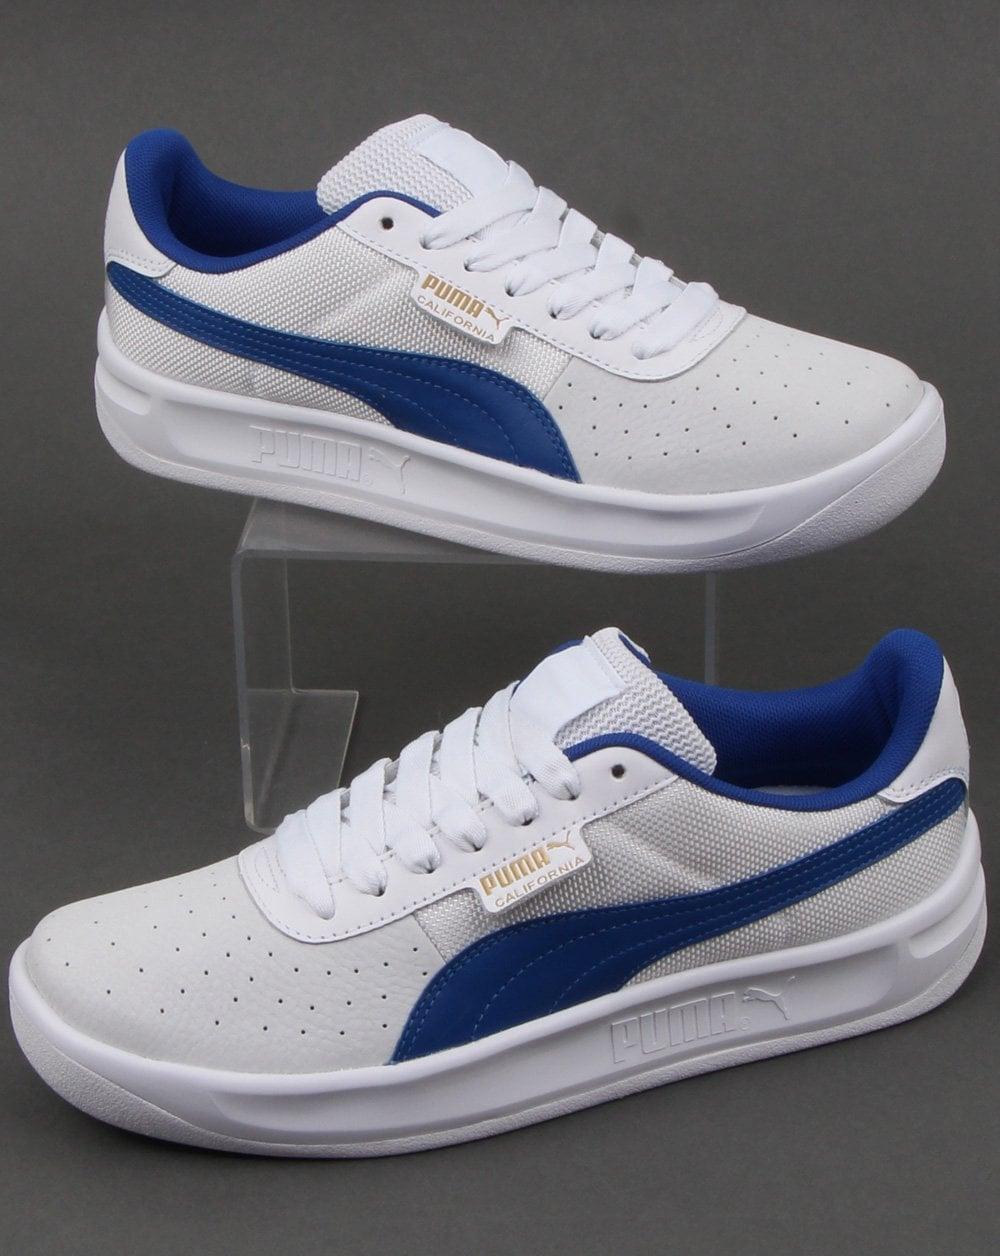 Puma California Trainer White/Blue